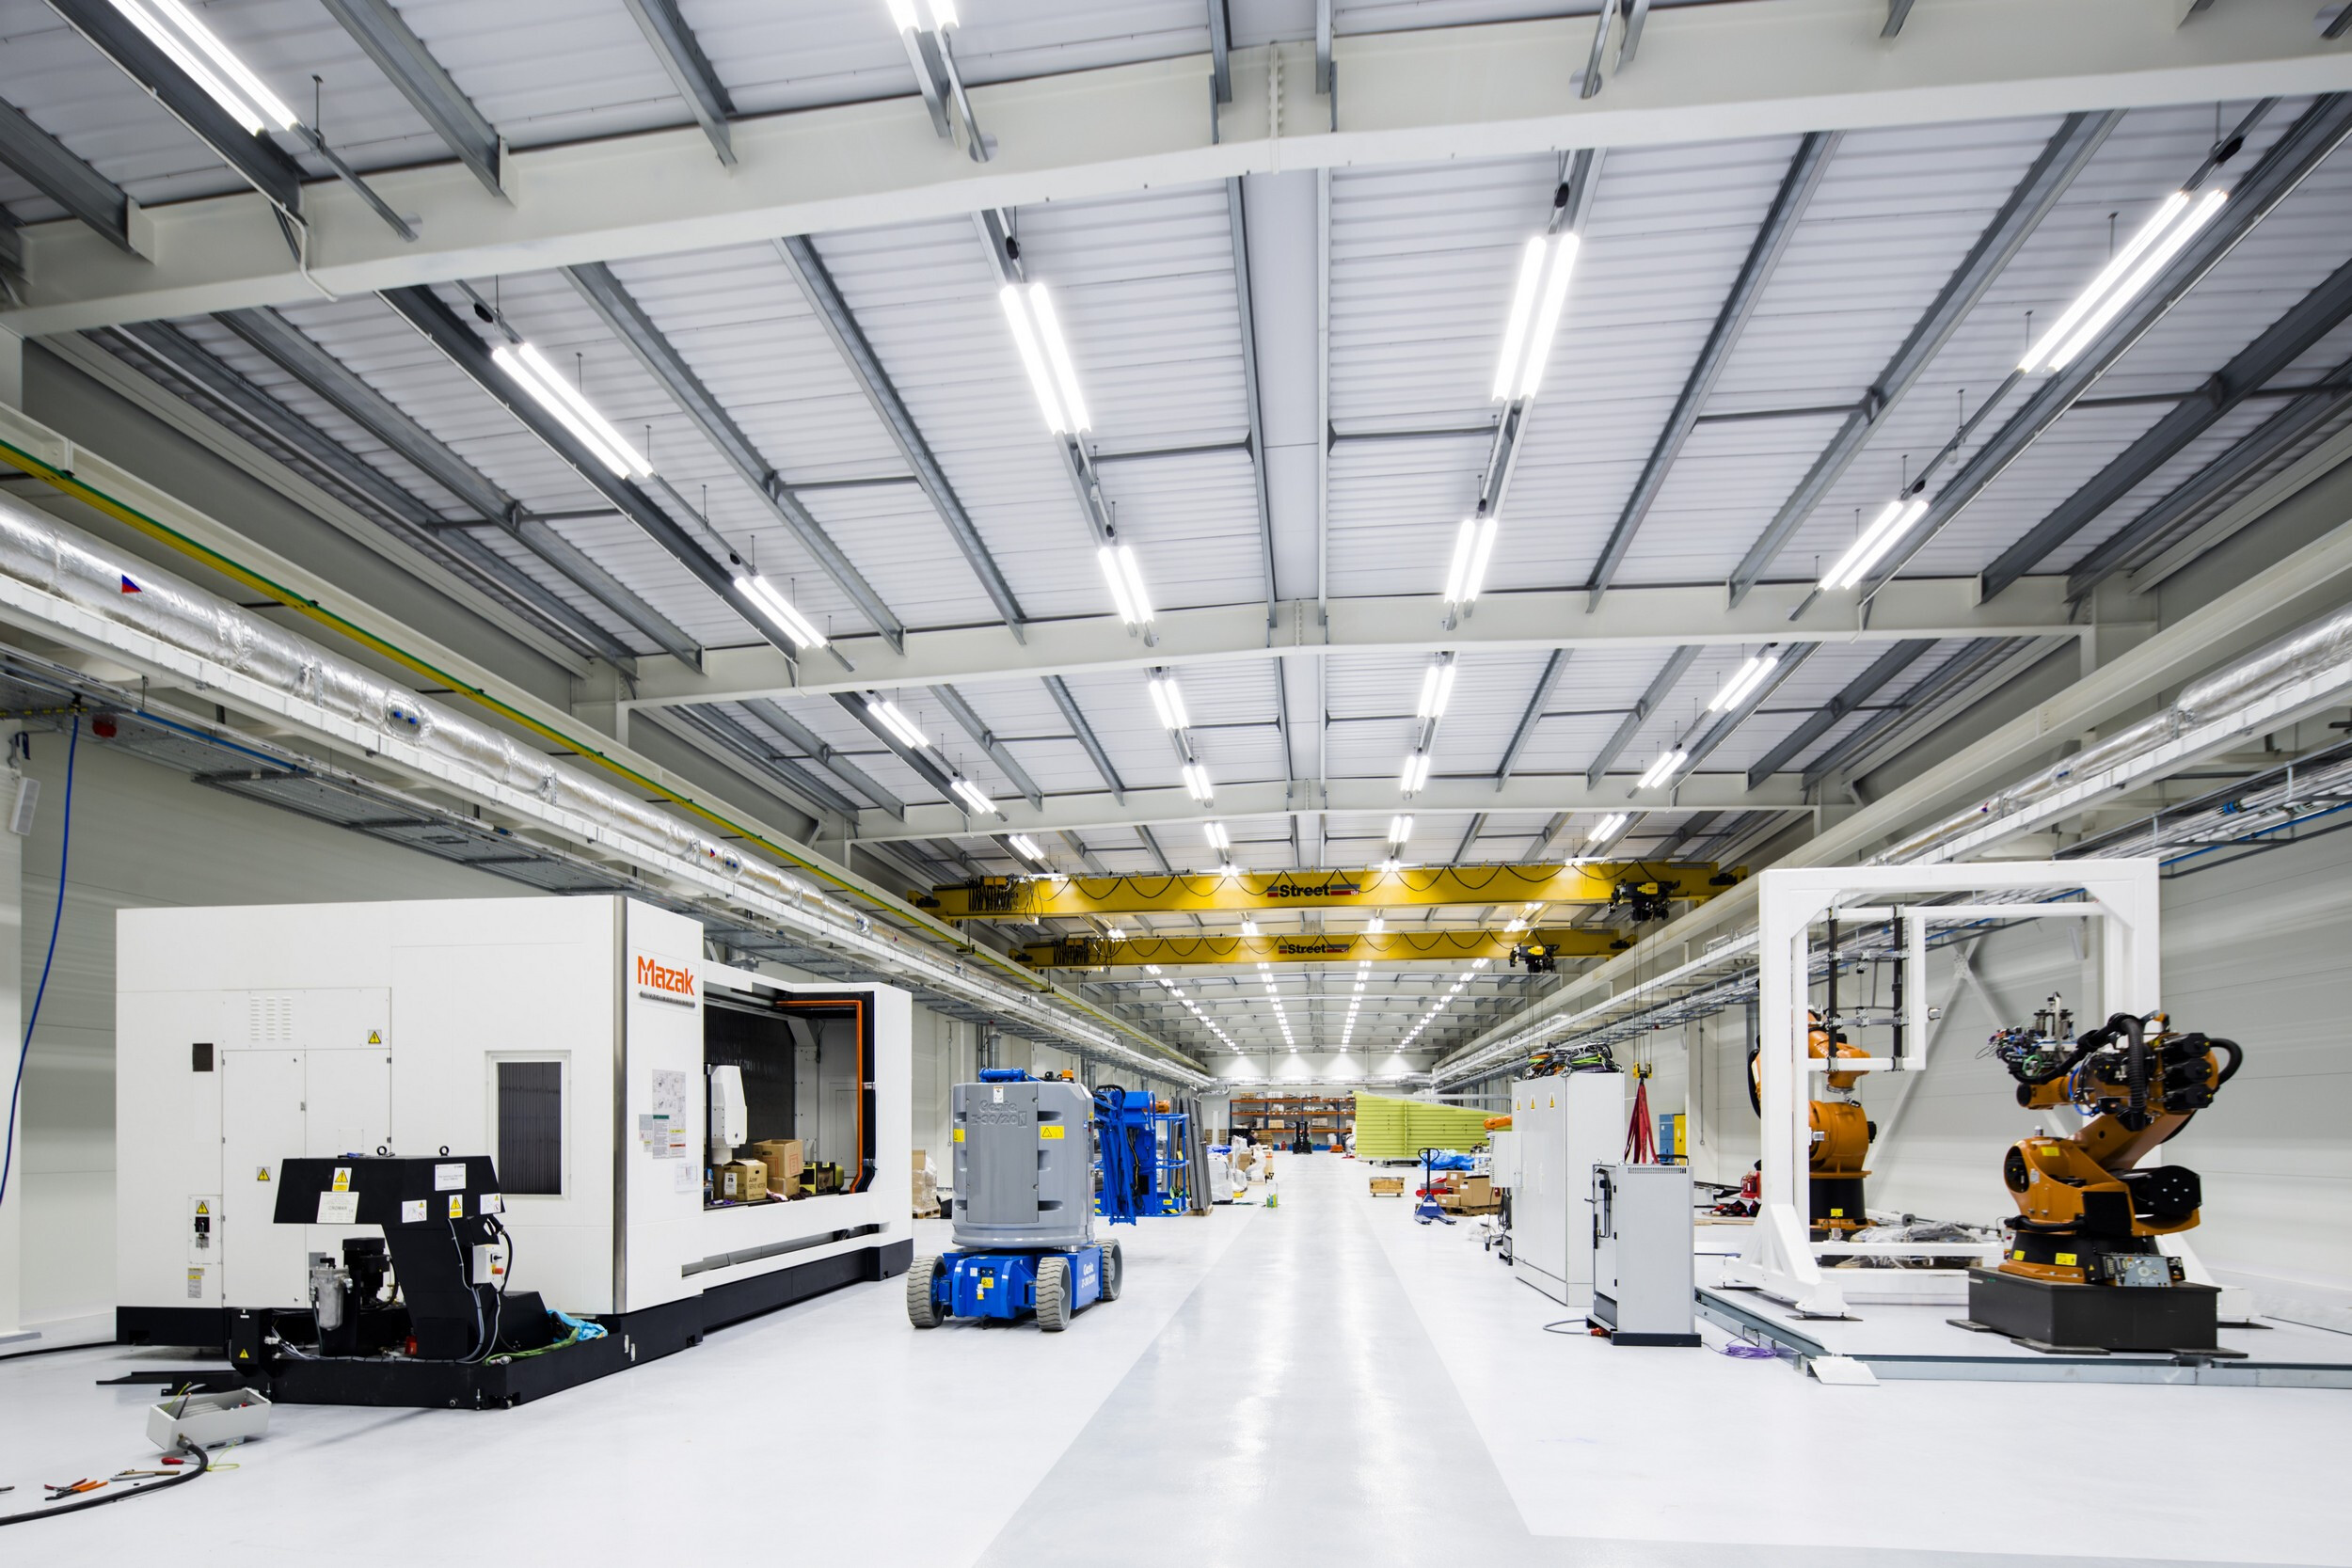 Factory 2050